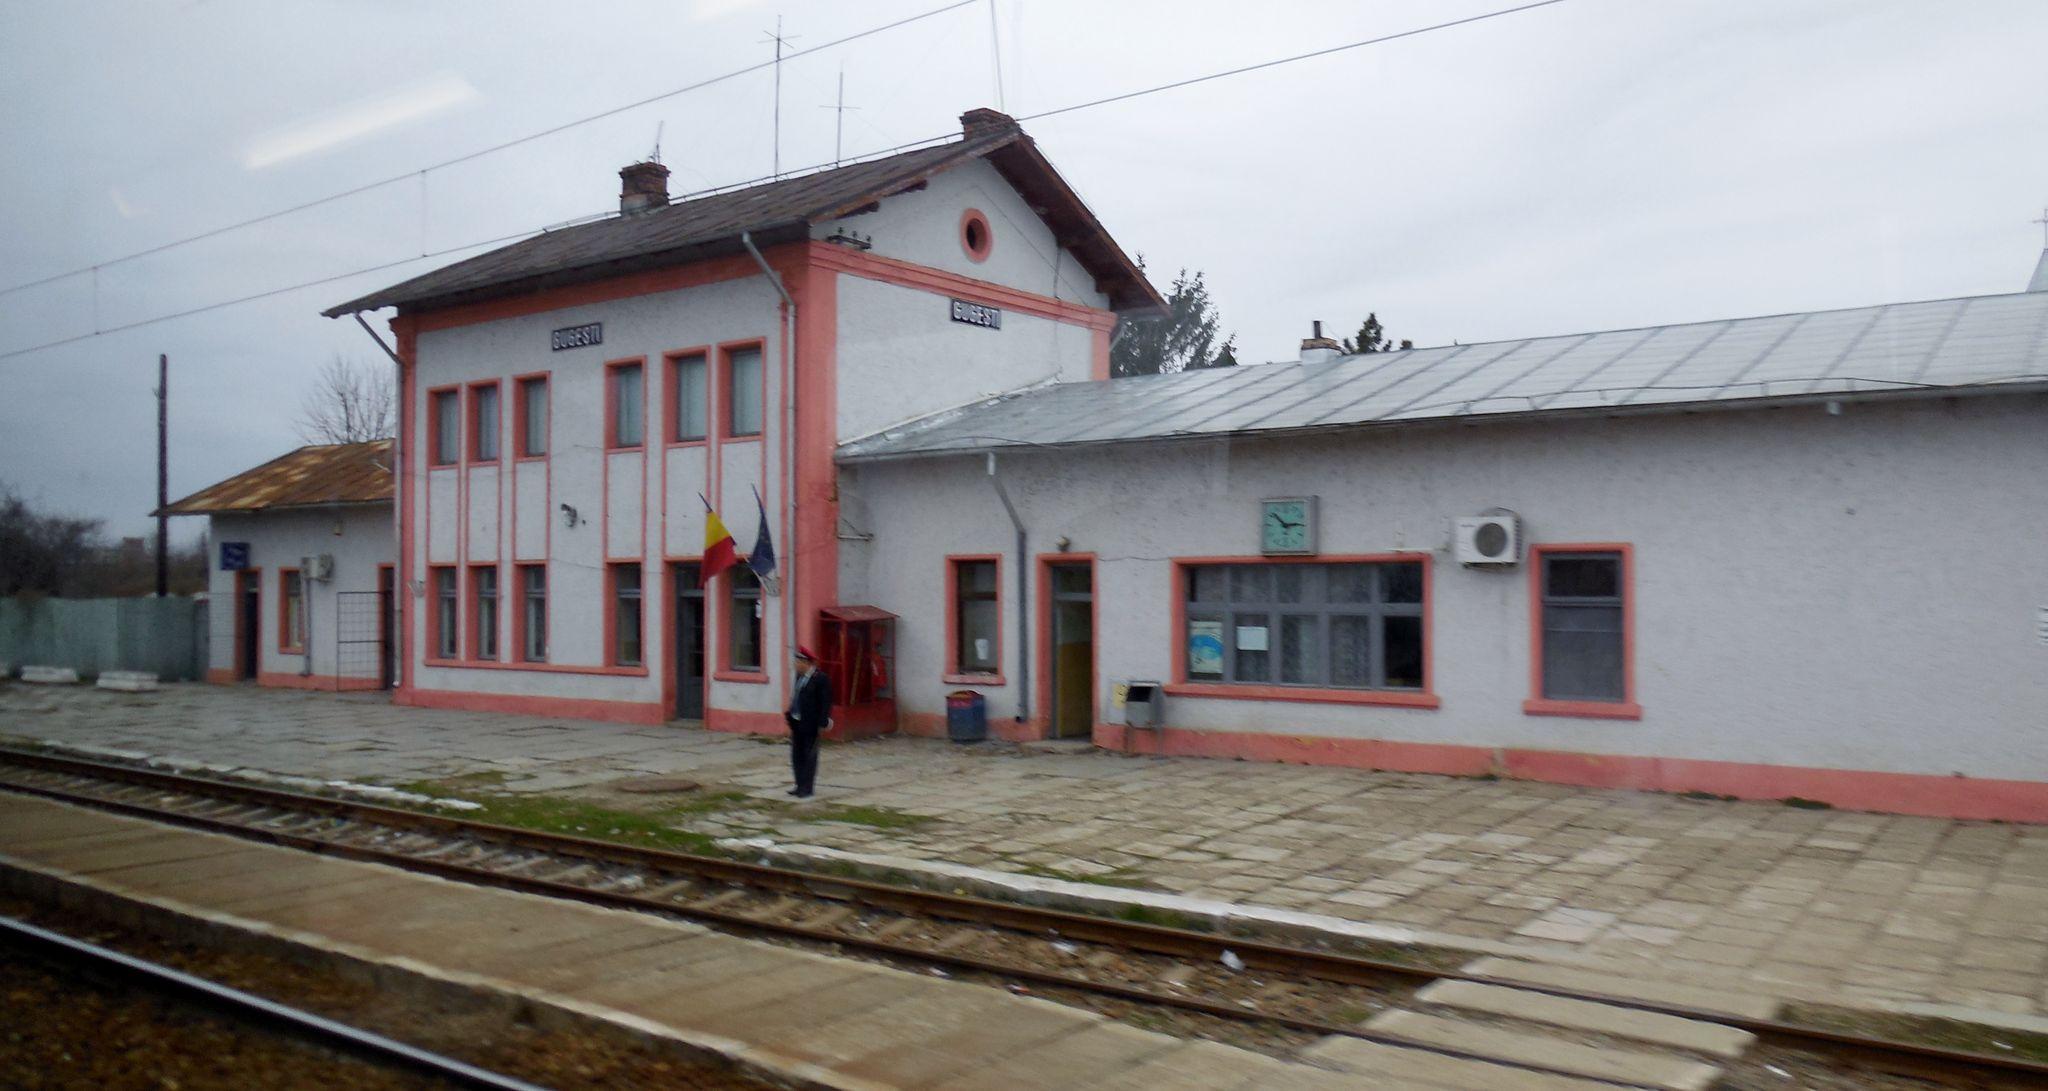 Gugesti (Roumanie)